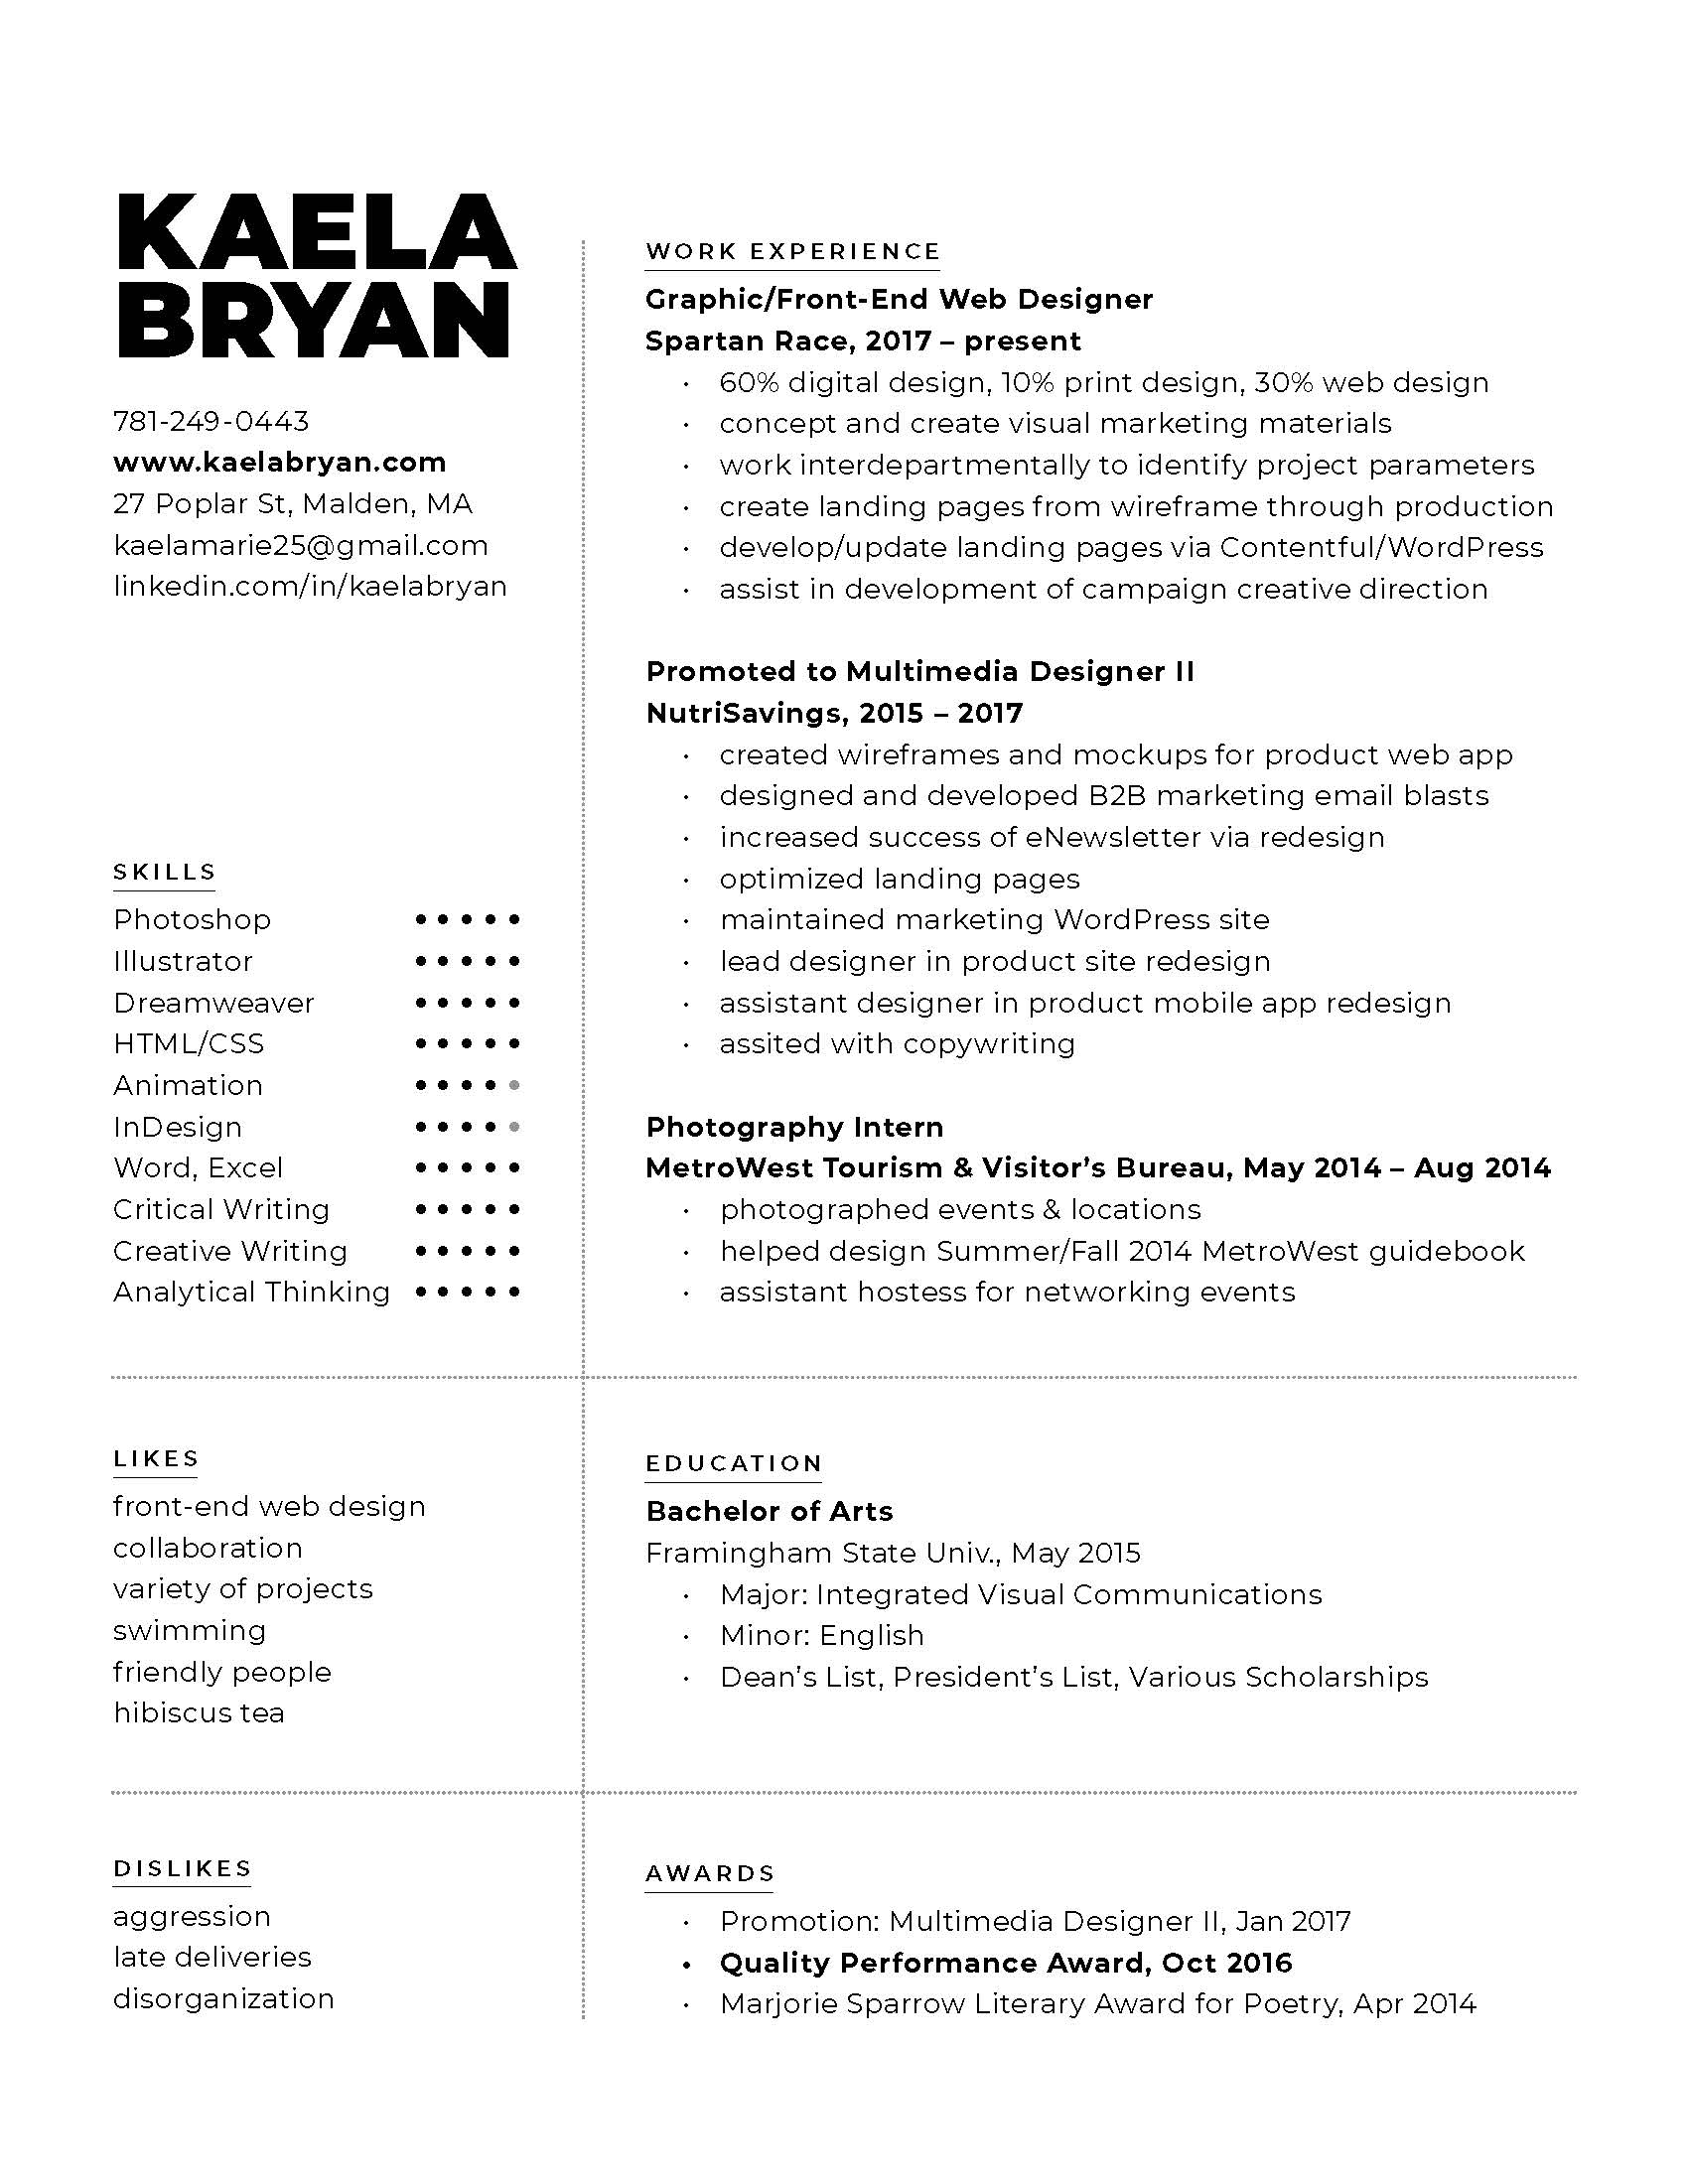 Kaela Bryan - Resume